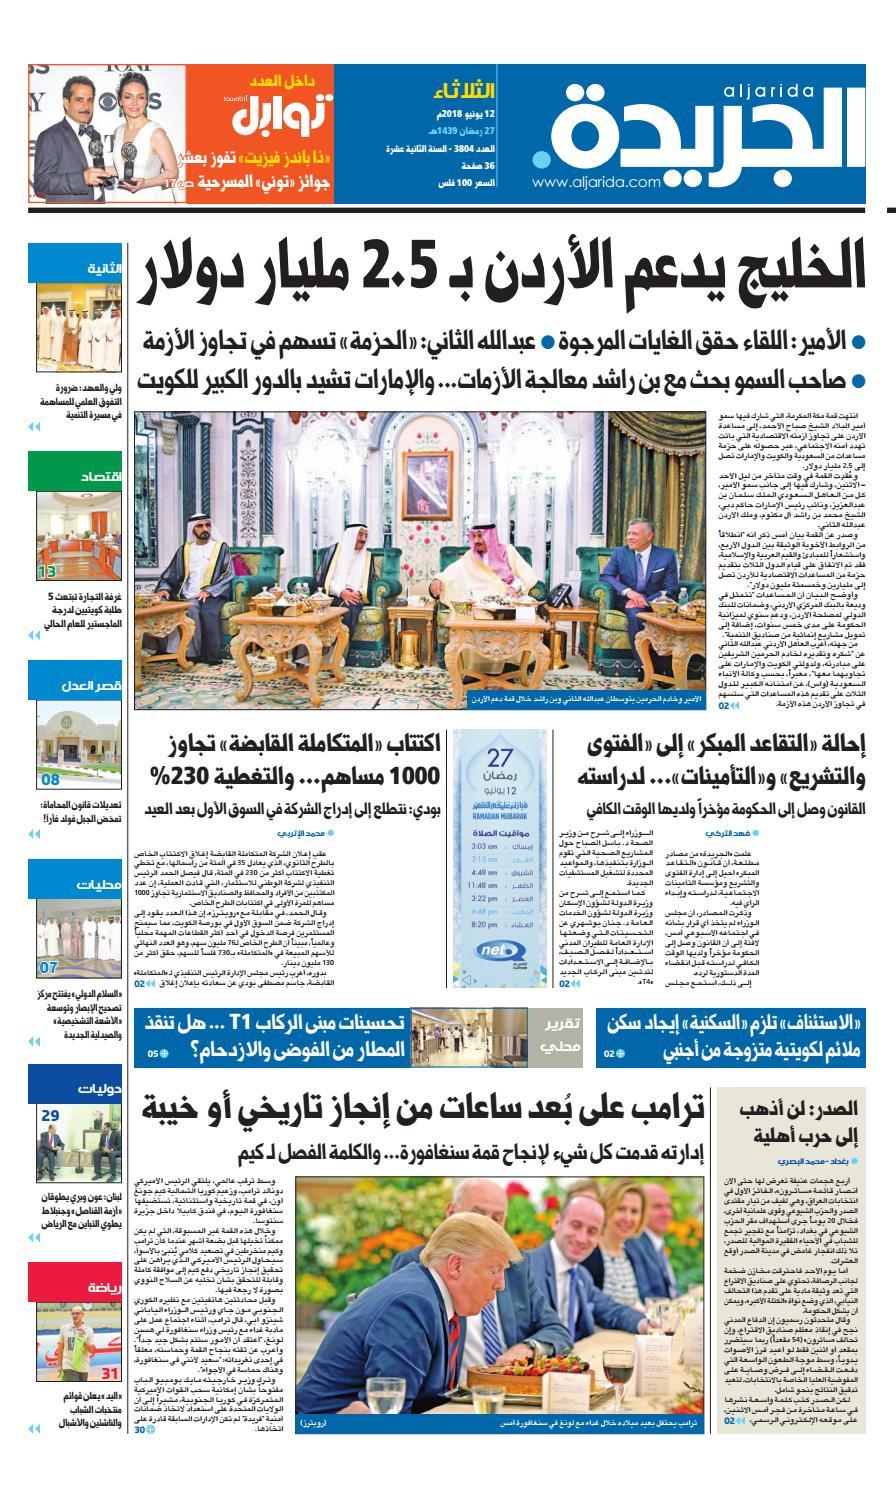 a9daeb89745c6 عدد الجريدة الثلاثاء 12 يونيو 2018 by Aljarida Newspaper - issuu